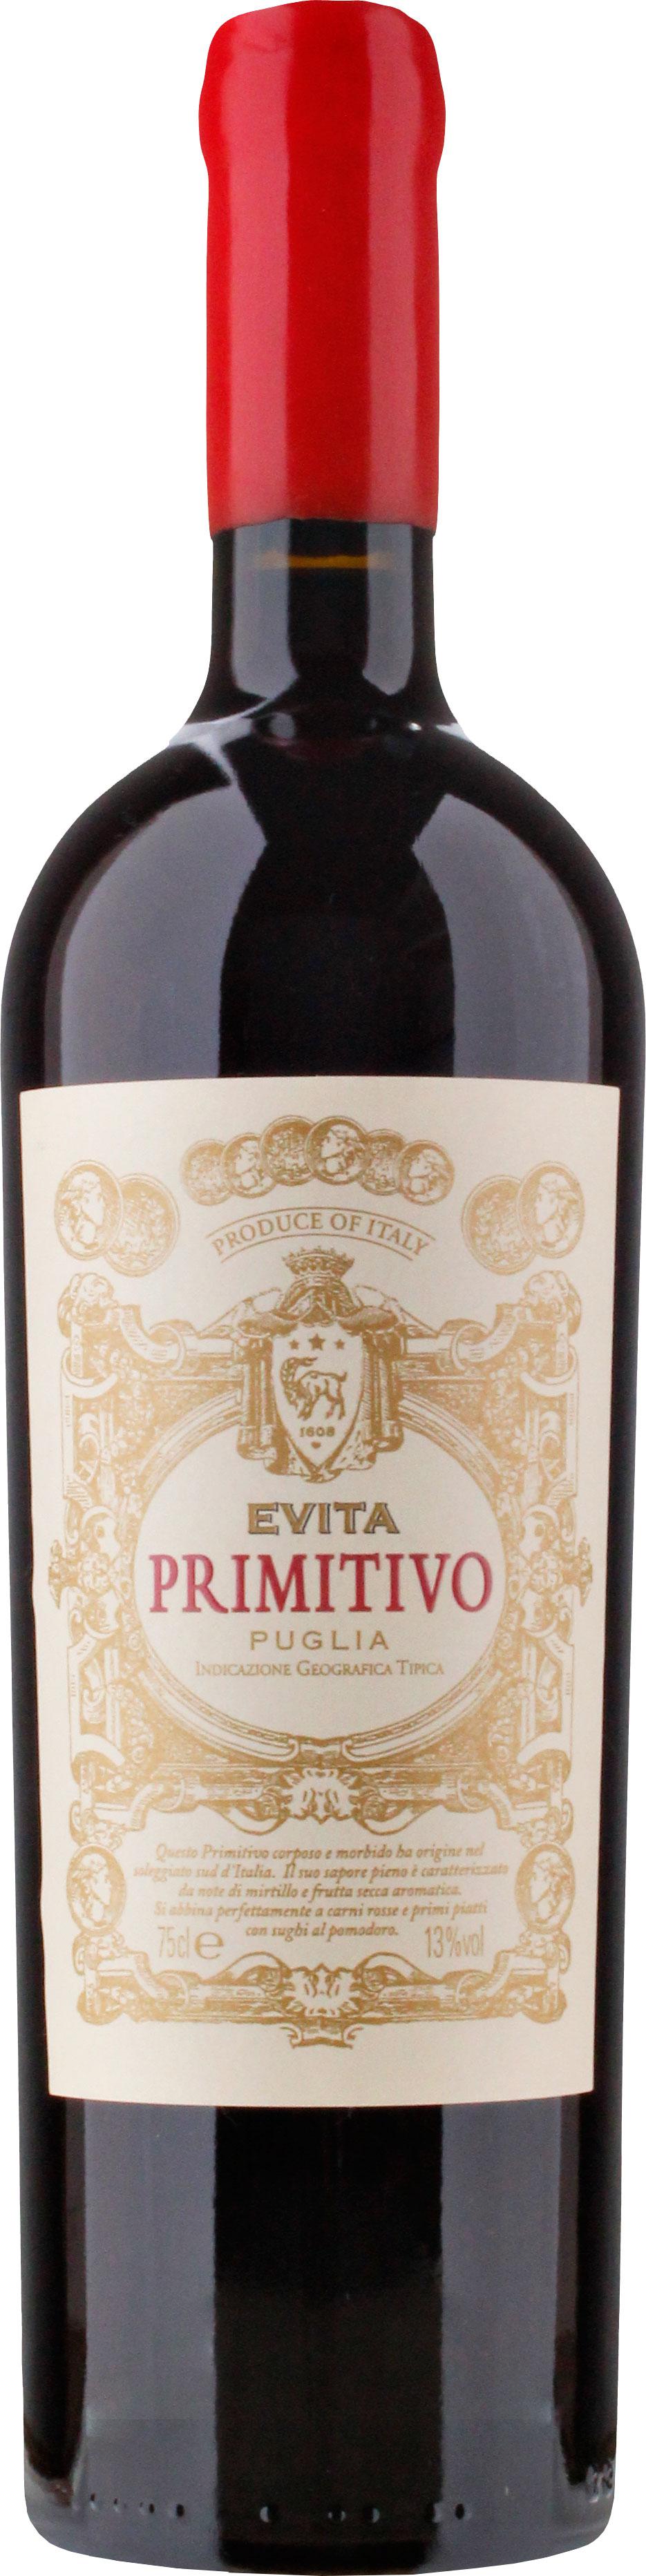 Evita_Primitivo